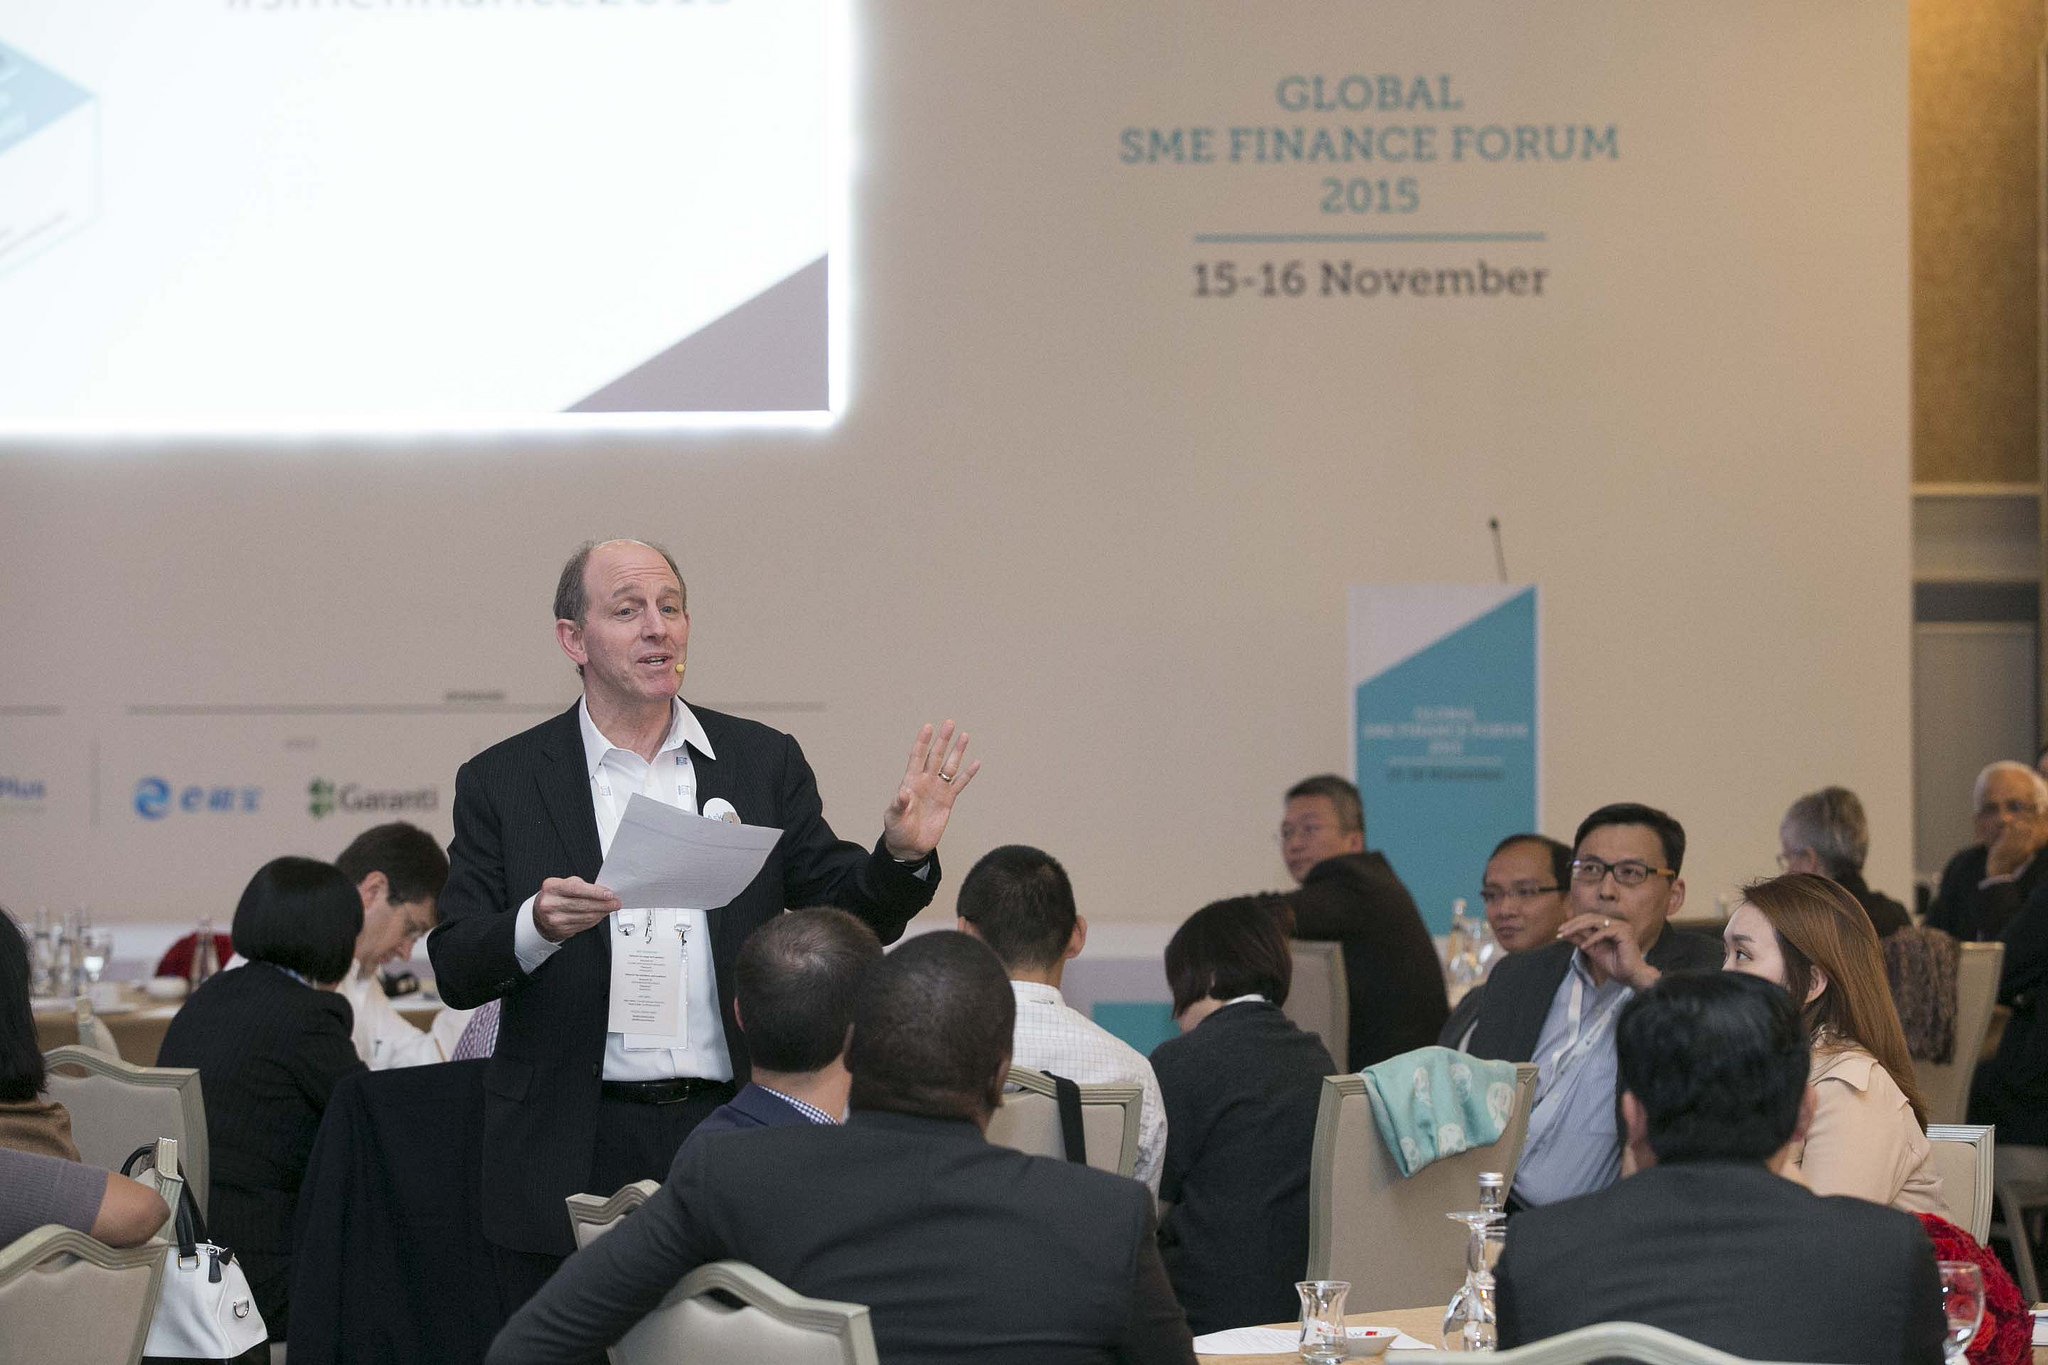 SME_Finance_Forum_Matt.jpg